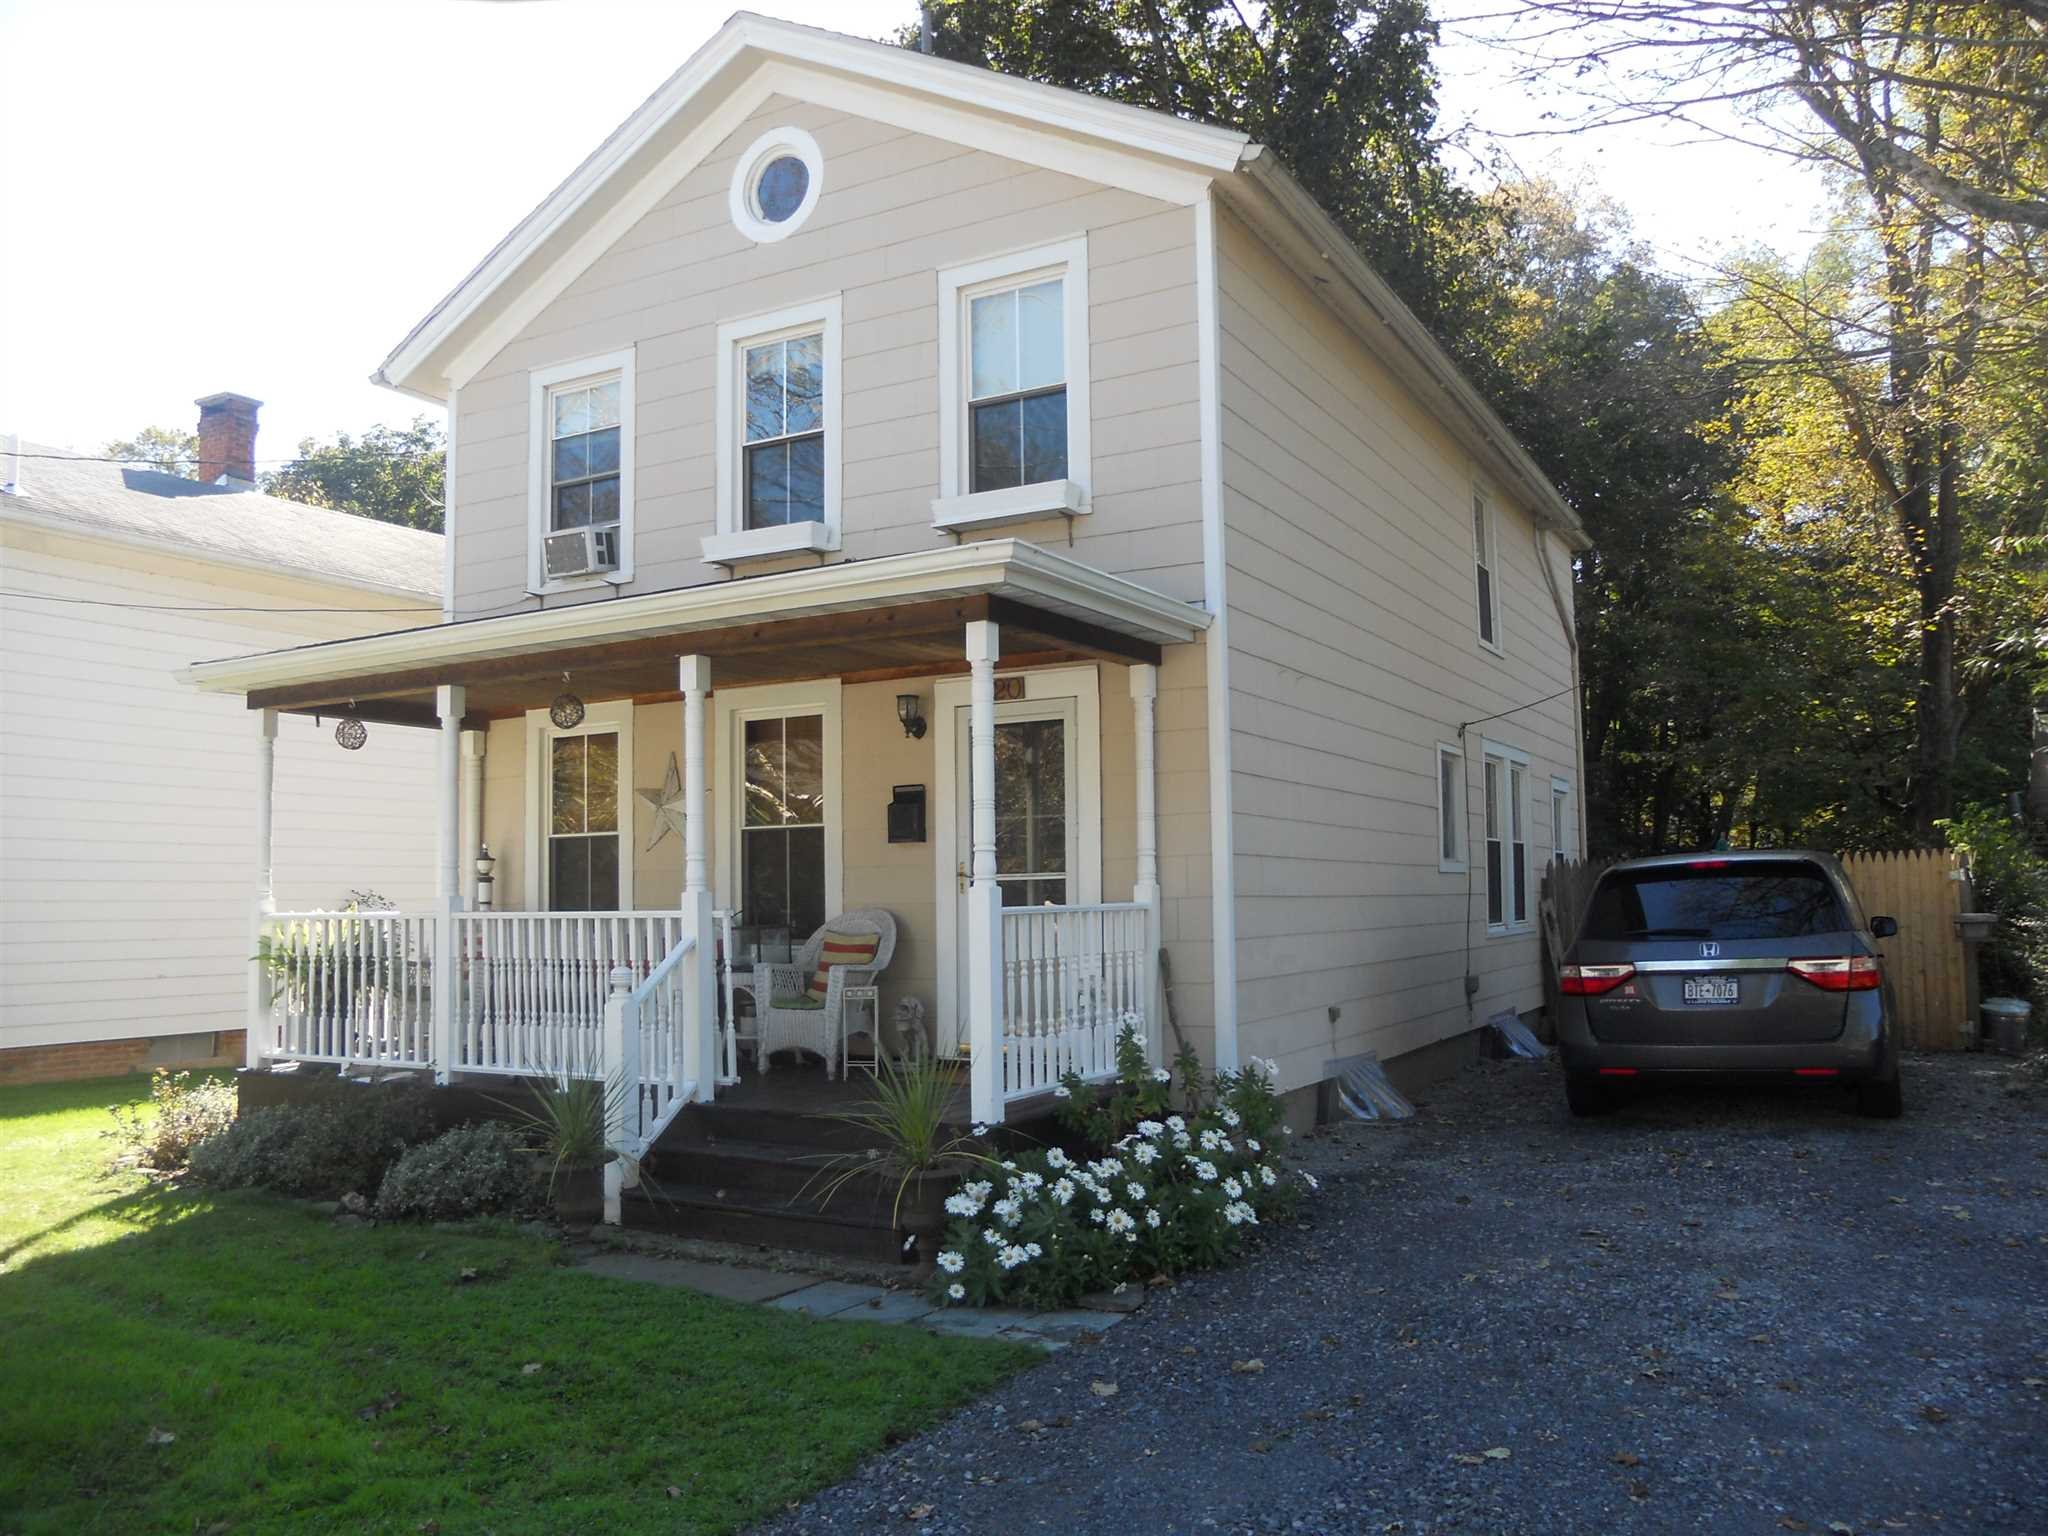 Single Family Home for Sale at 20 E MARKET 20 E MARKET Hyde Park, New York 12538 United States